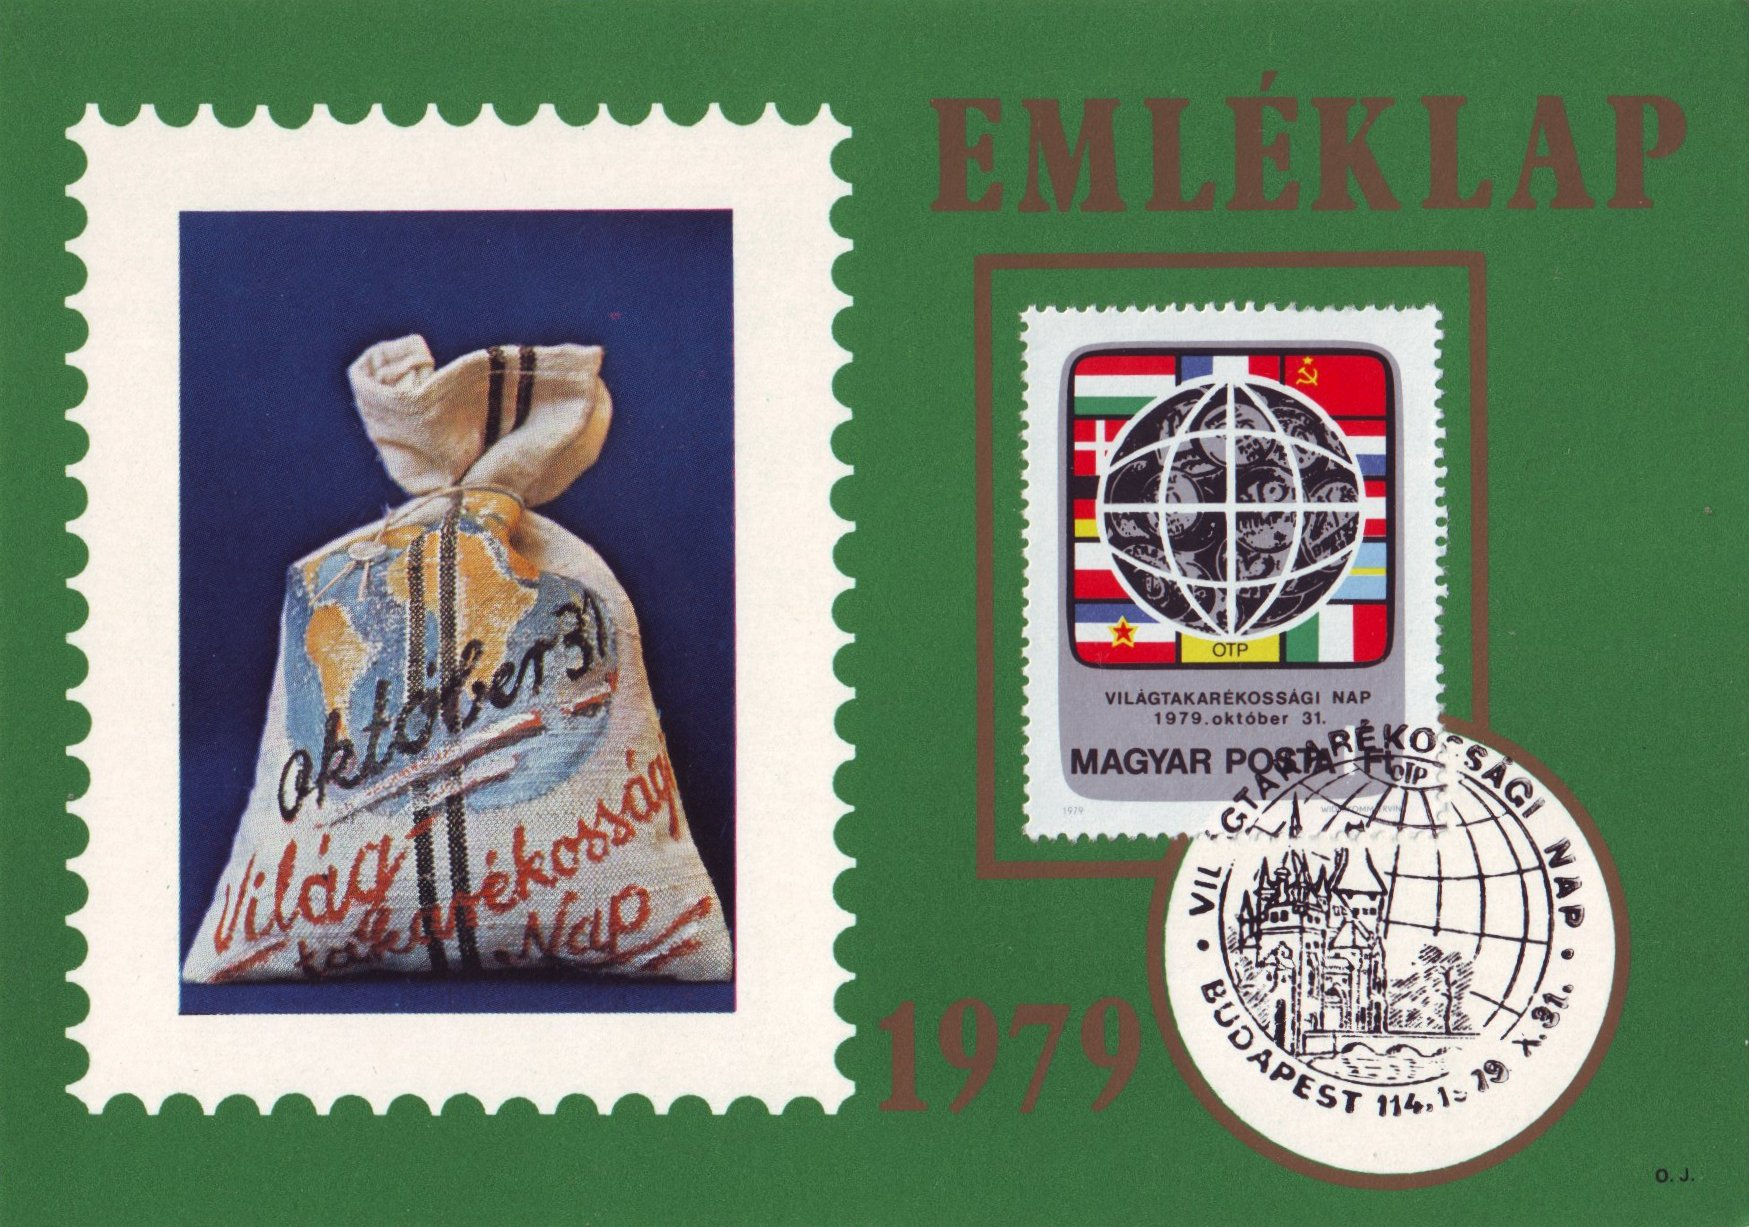 http://www.forintportal.hu/emleklap/www_forintportal_hu_vilagtakarekossagi_nap_1979_a_nagy.jpg